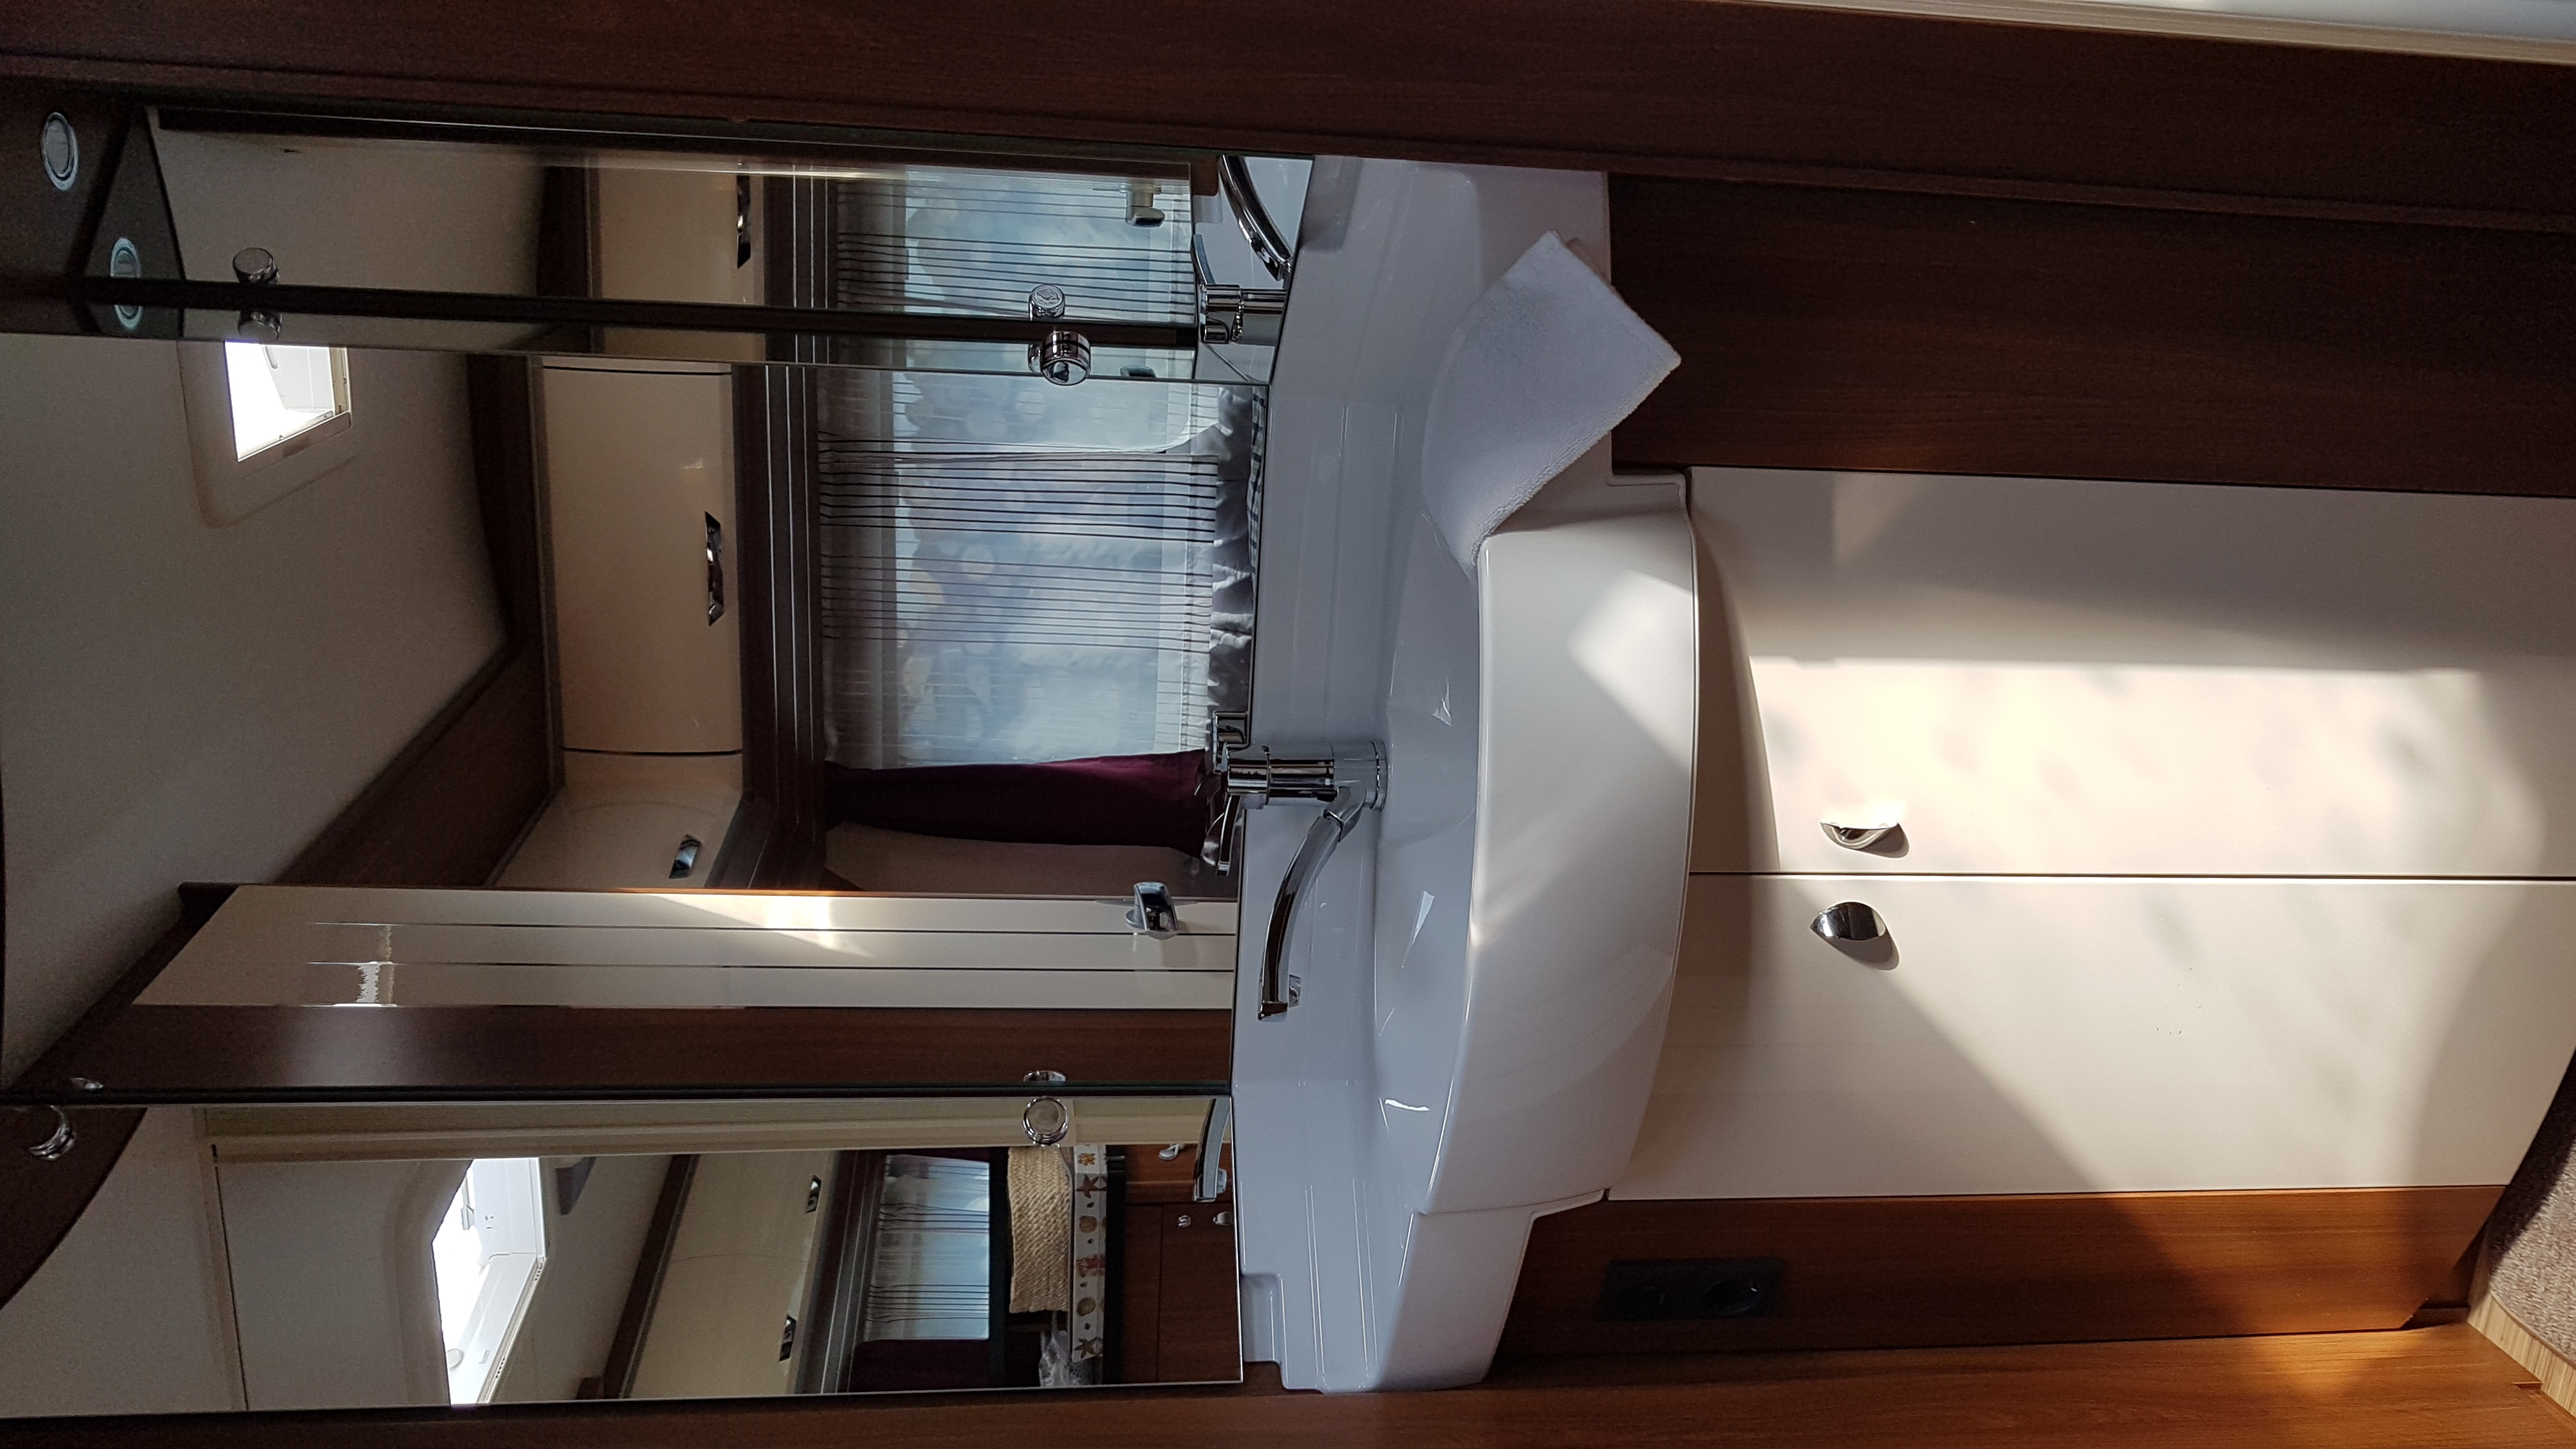 hobby 560 cfe premium occasion de 2014 caravane en vente bourg en bresse ain 01. Black Bedroom Furniture Sets. Home Design Ideas